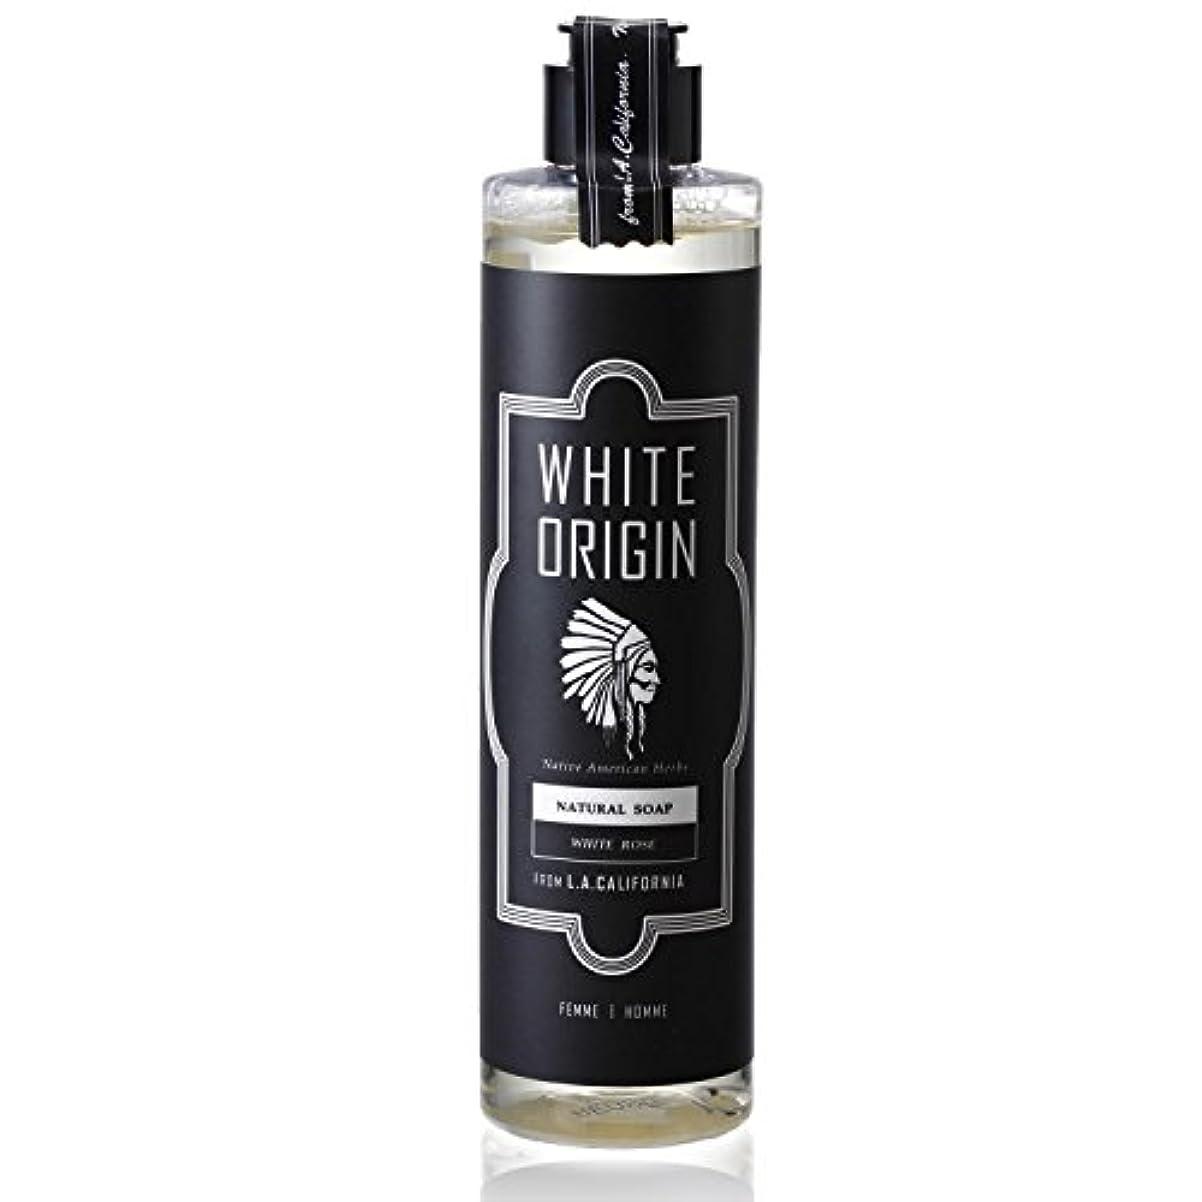 WHITE ORIGIN ボディソープ 300ml 加齢臭 ケア オーガニック ナチュラル 男前 乾燥 ホワイトローズ